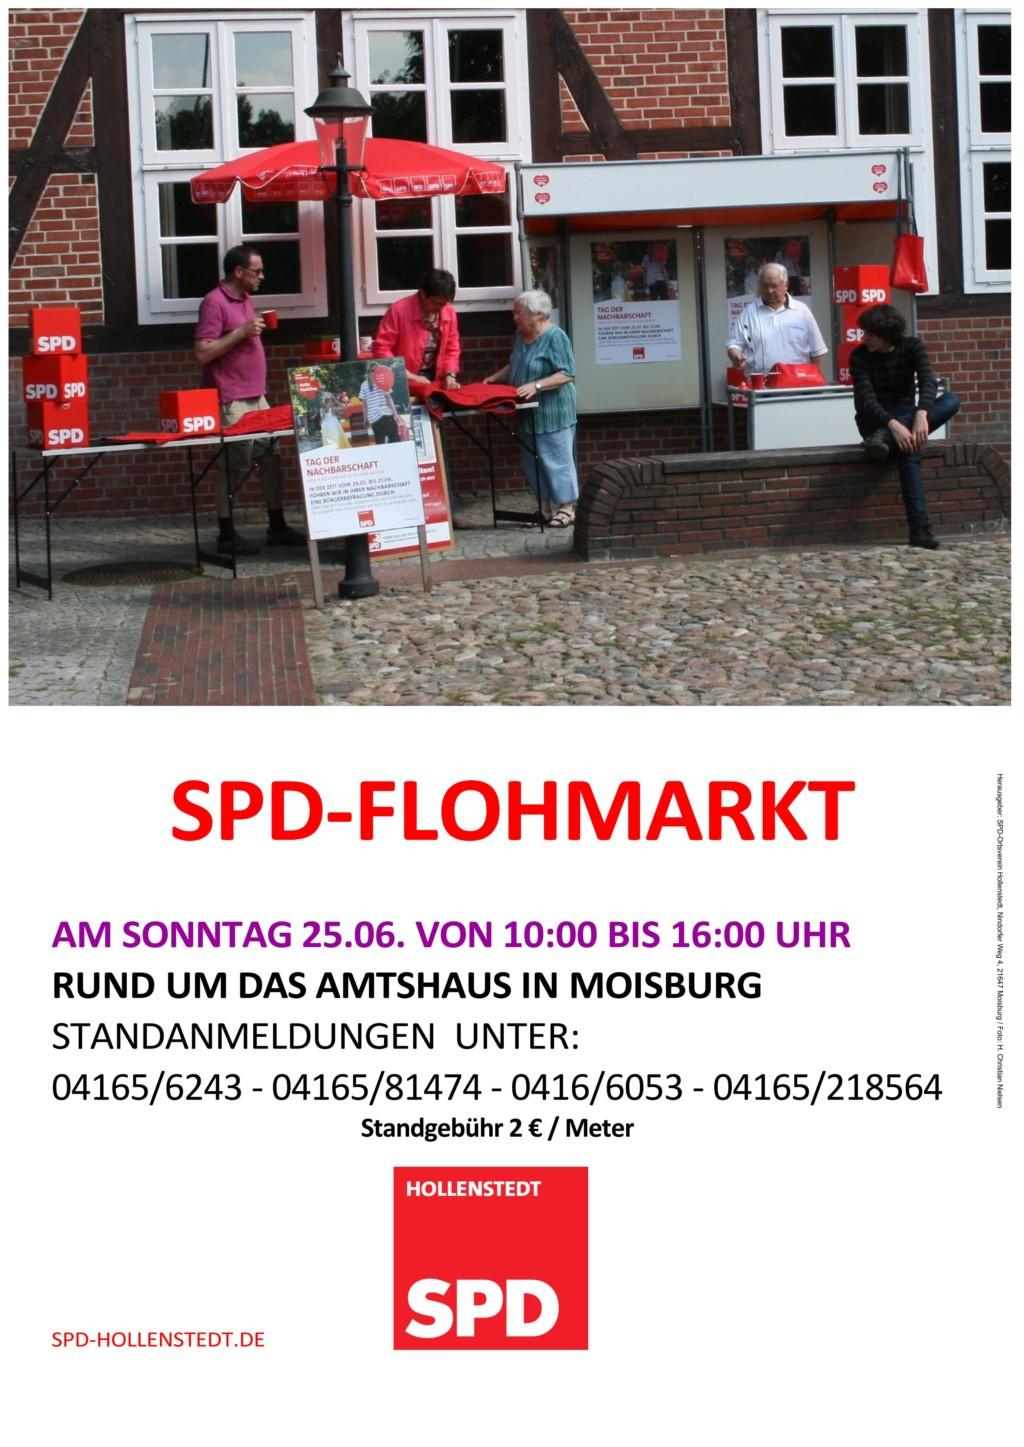 SPD Flohmarkt Moisburg 2017